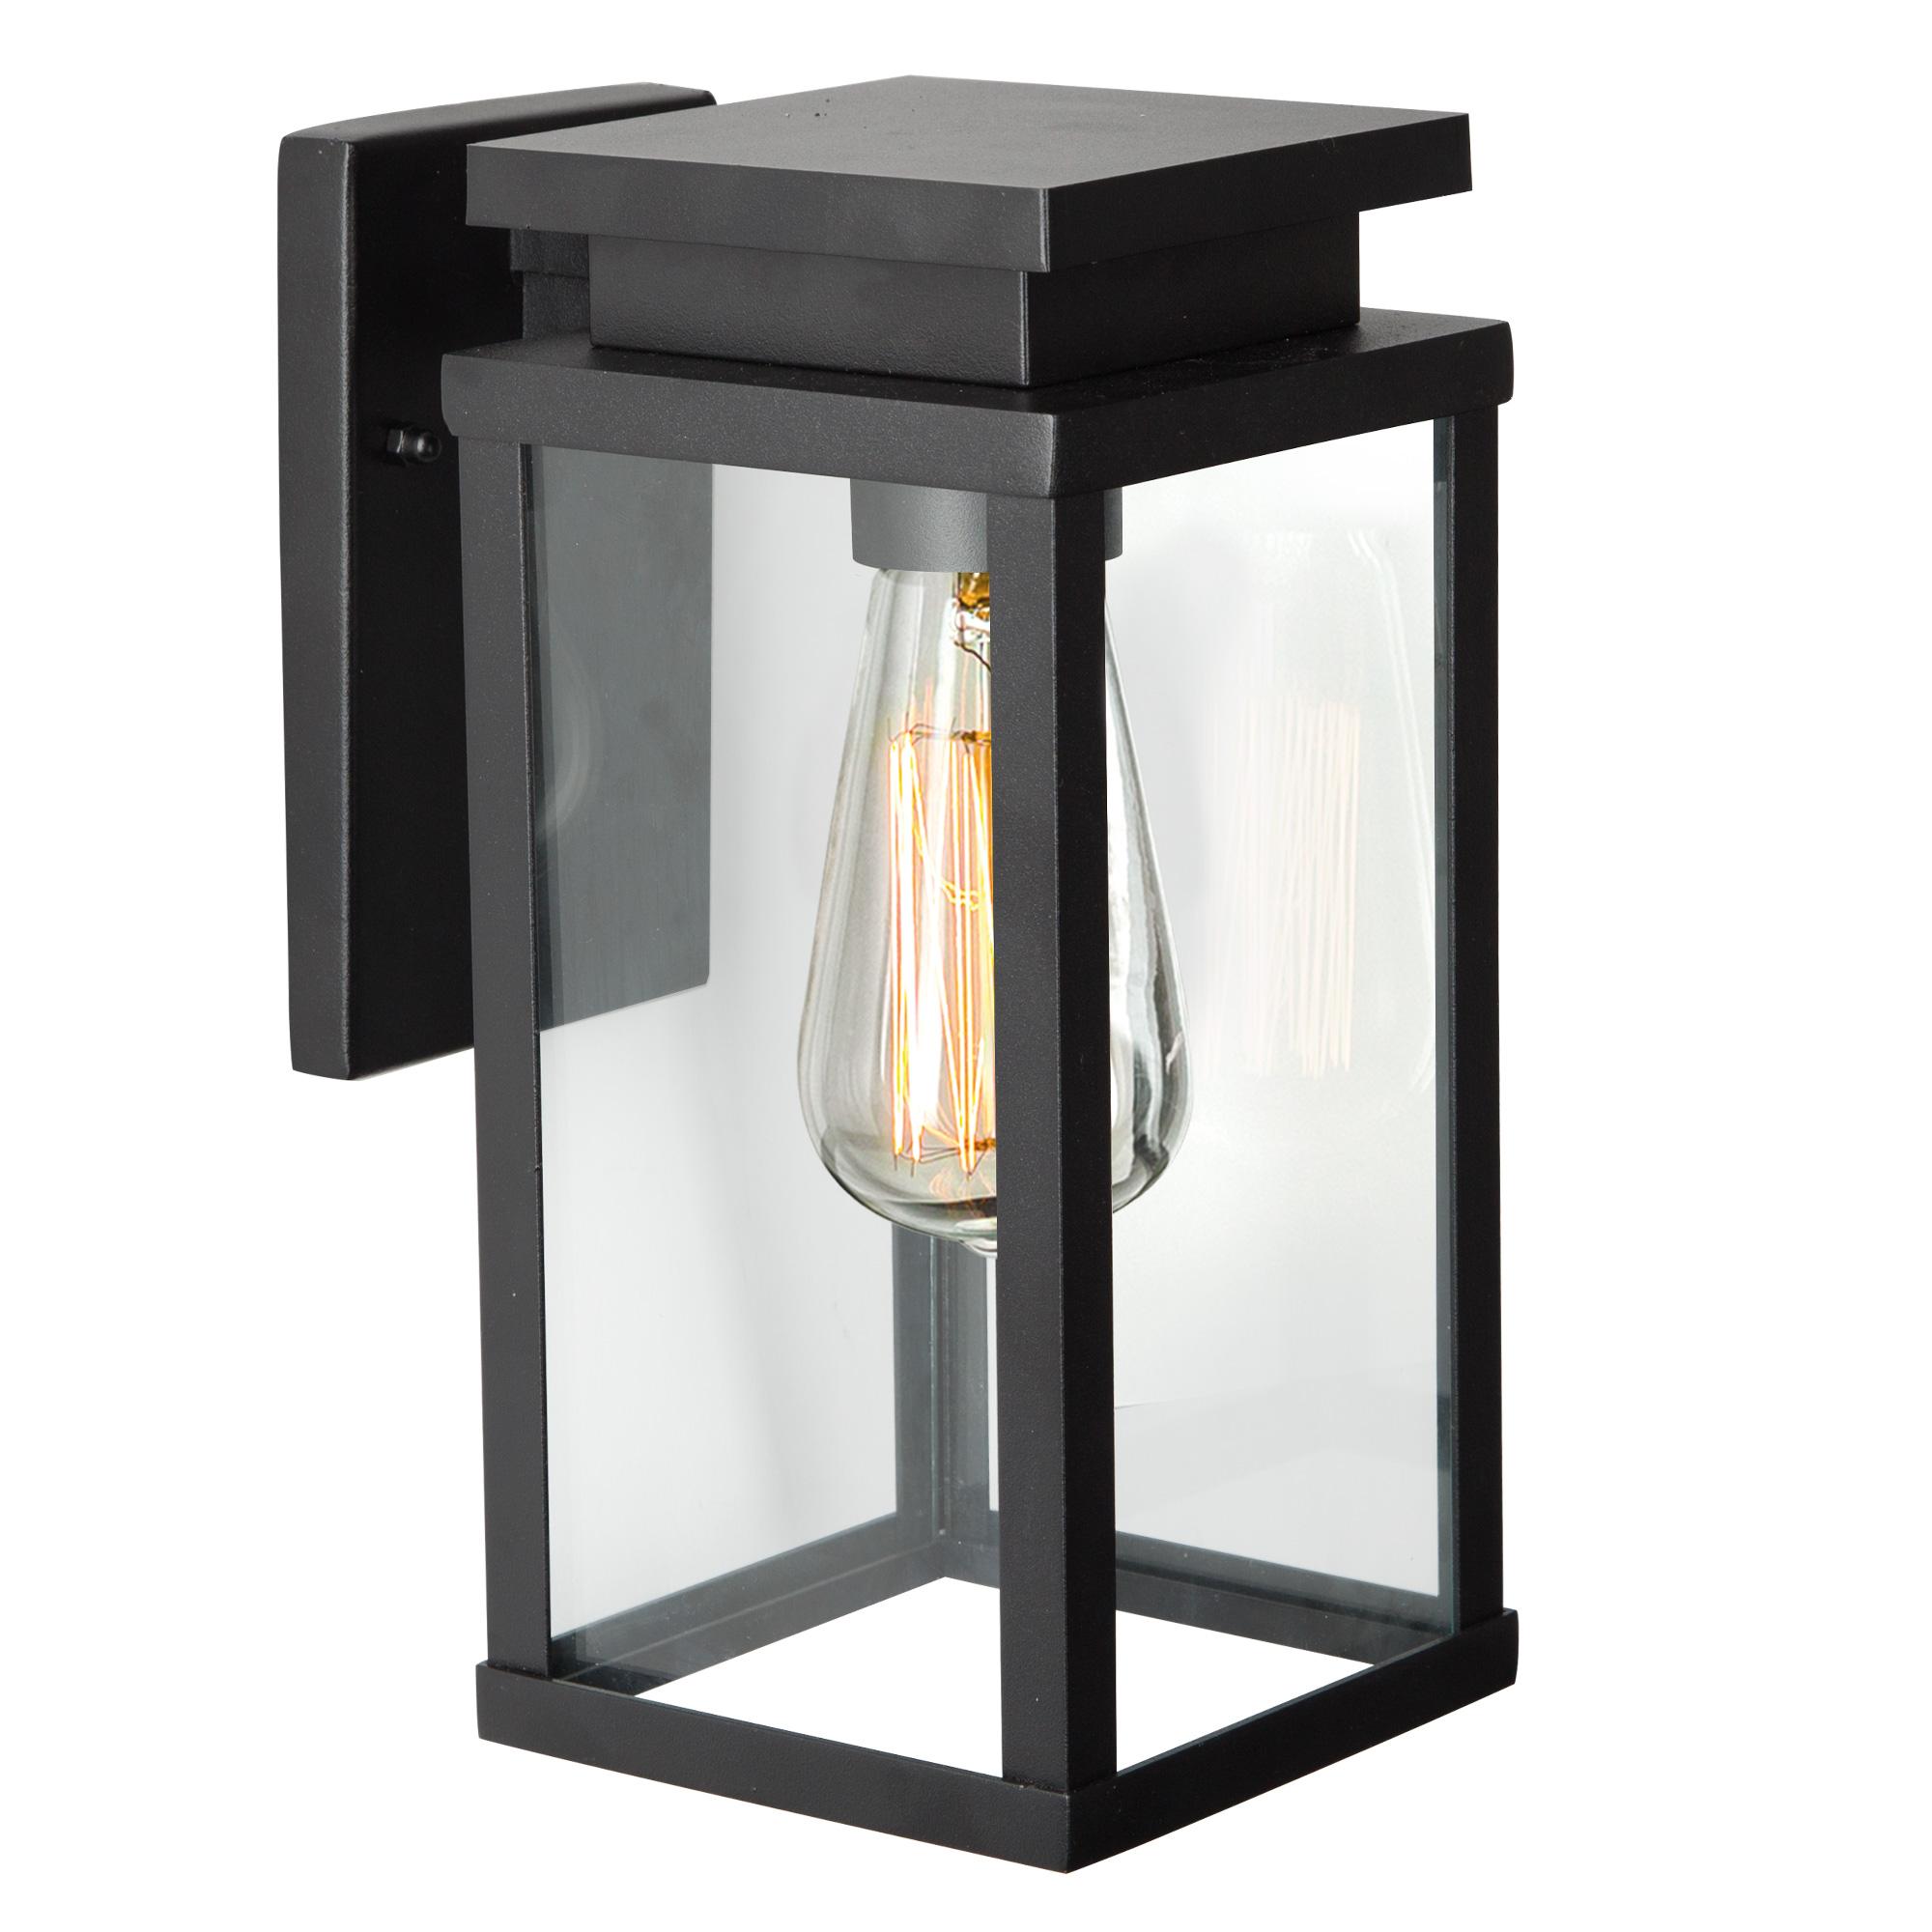 Buitenlamp Jersey Zwart Large Wandlamp